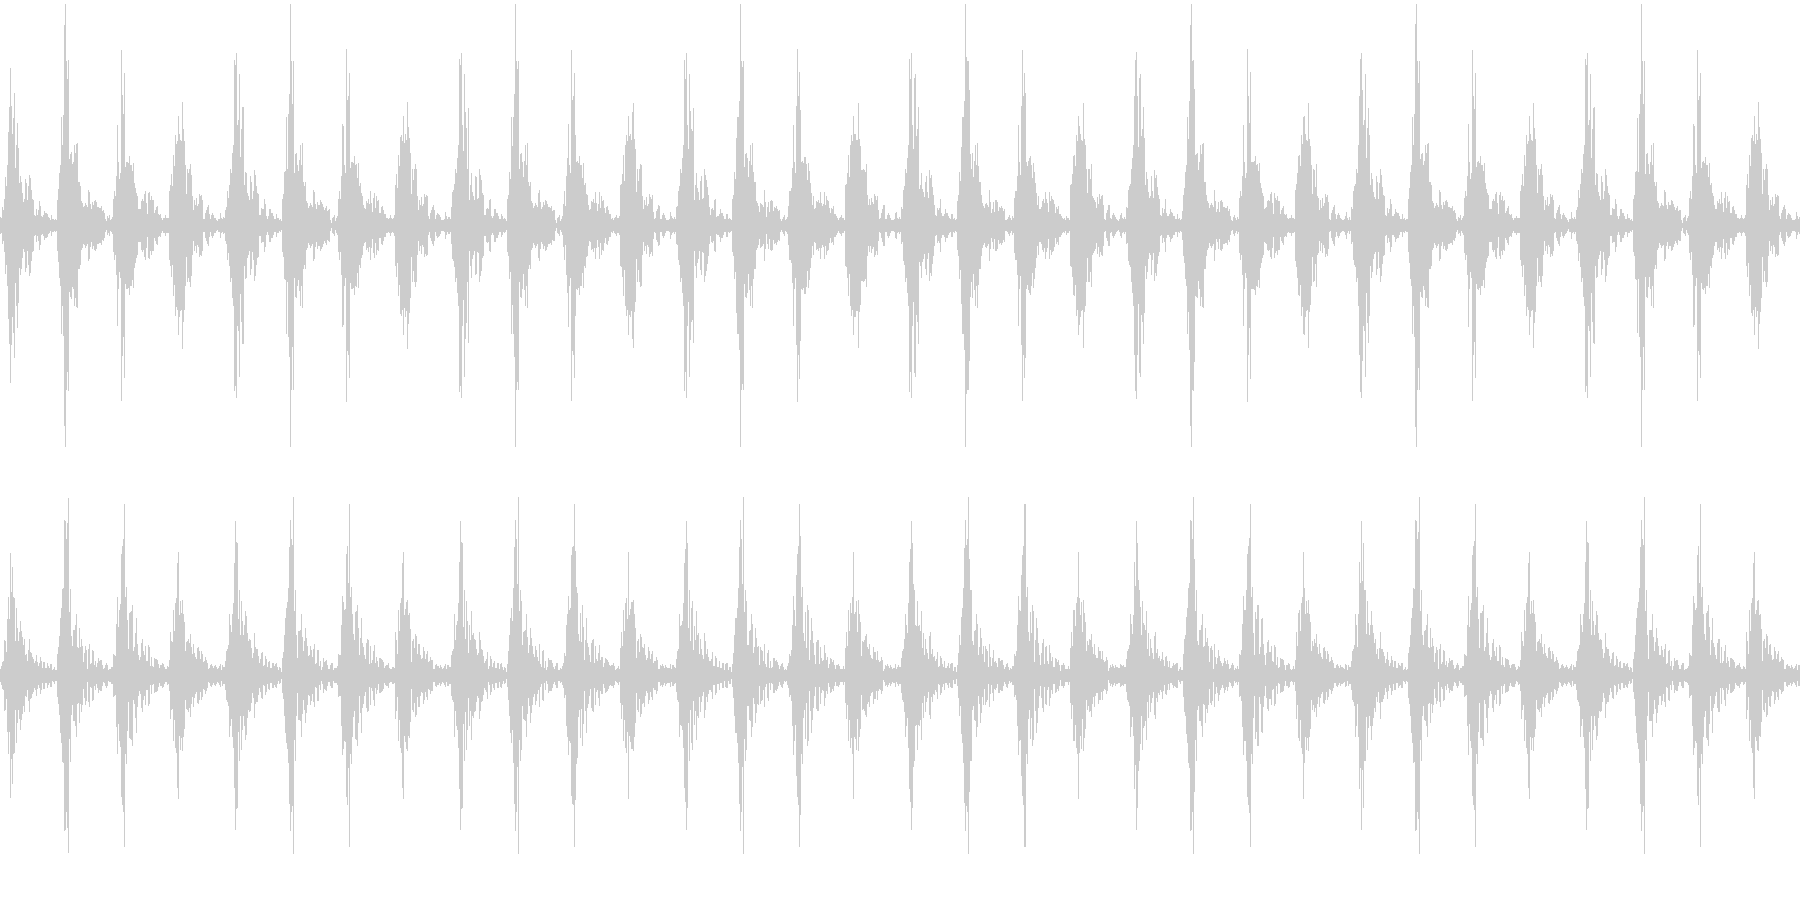 太鼓 躍動的 迫力 効果音ループ素材#2の未再生の波形